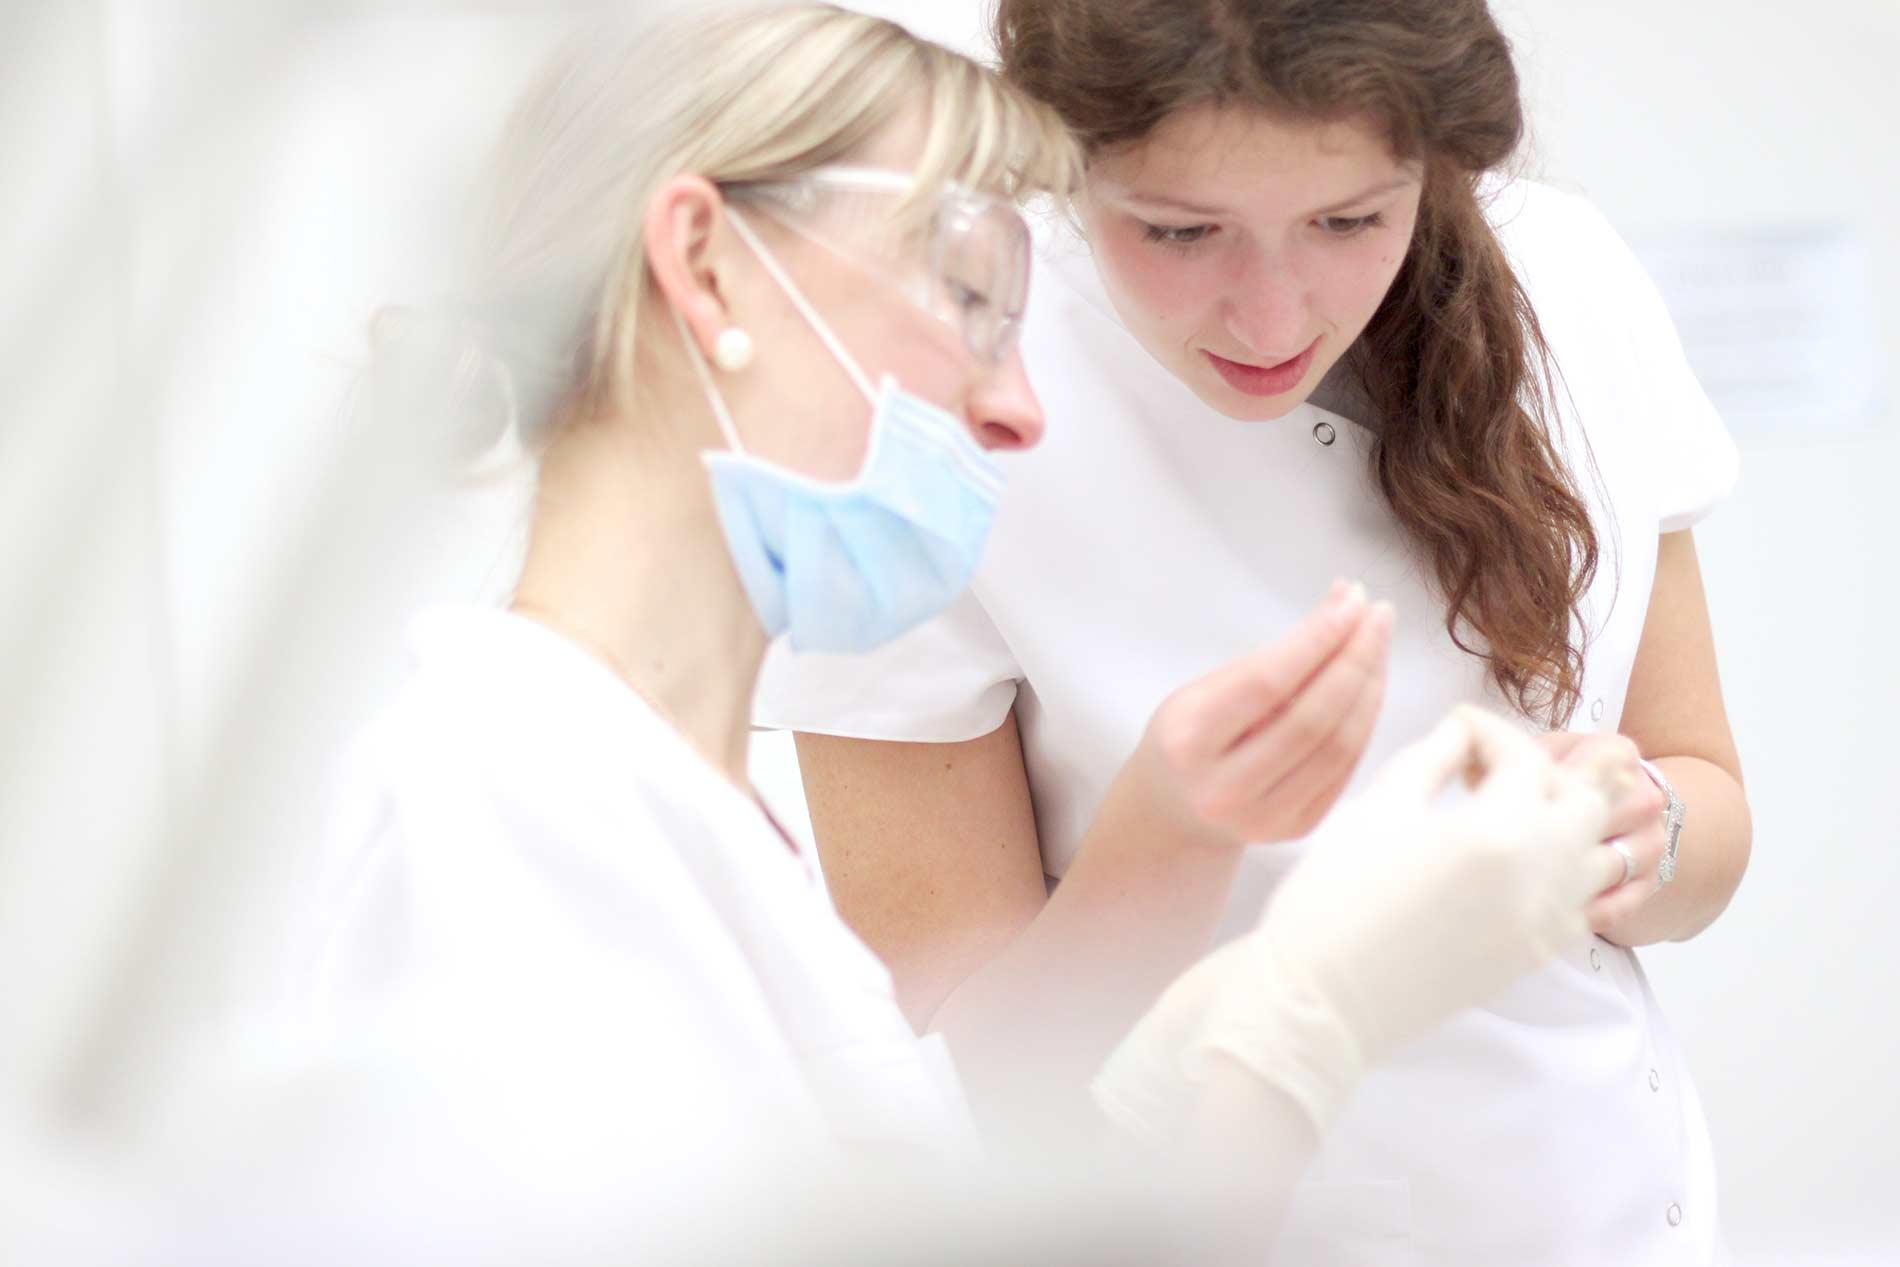 Dental-practice-business-overhead-insurance